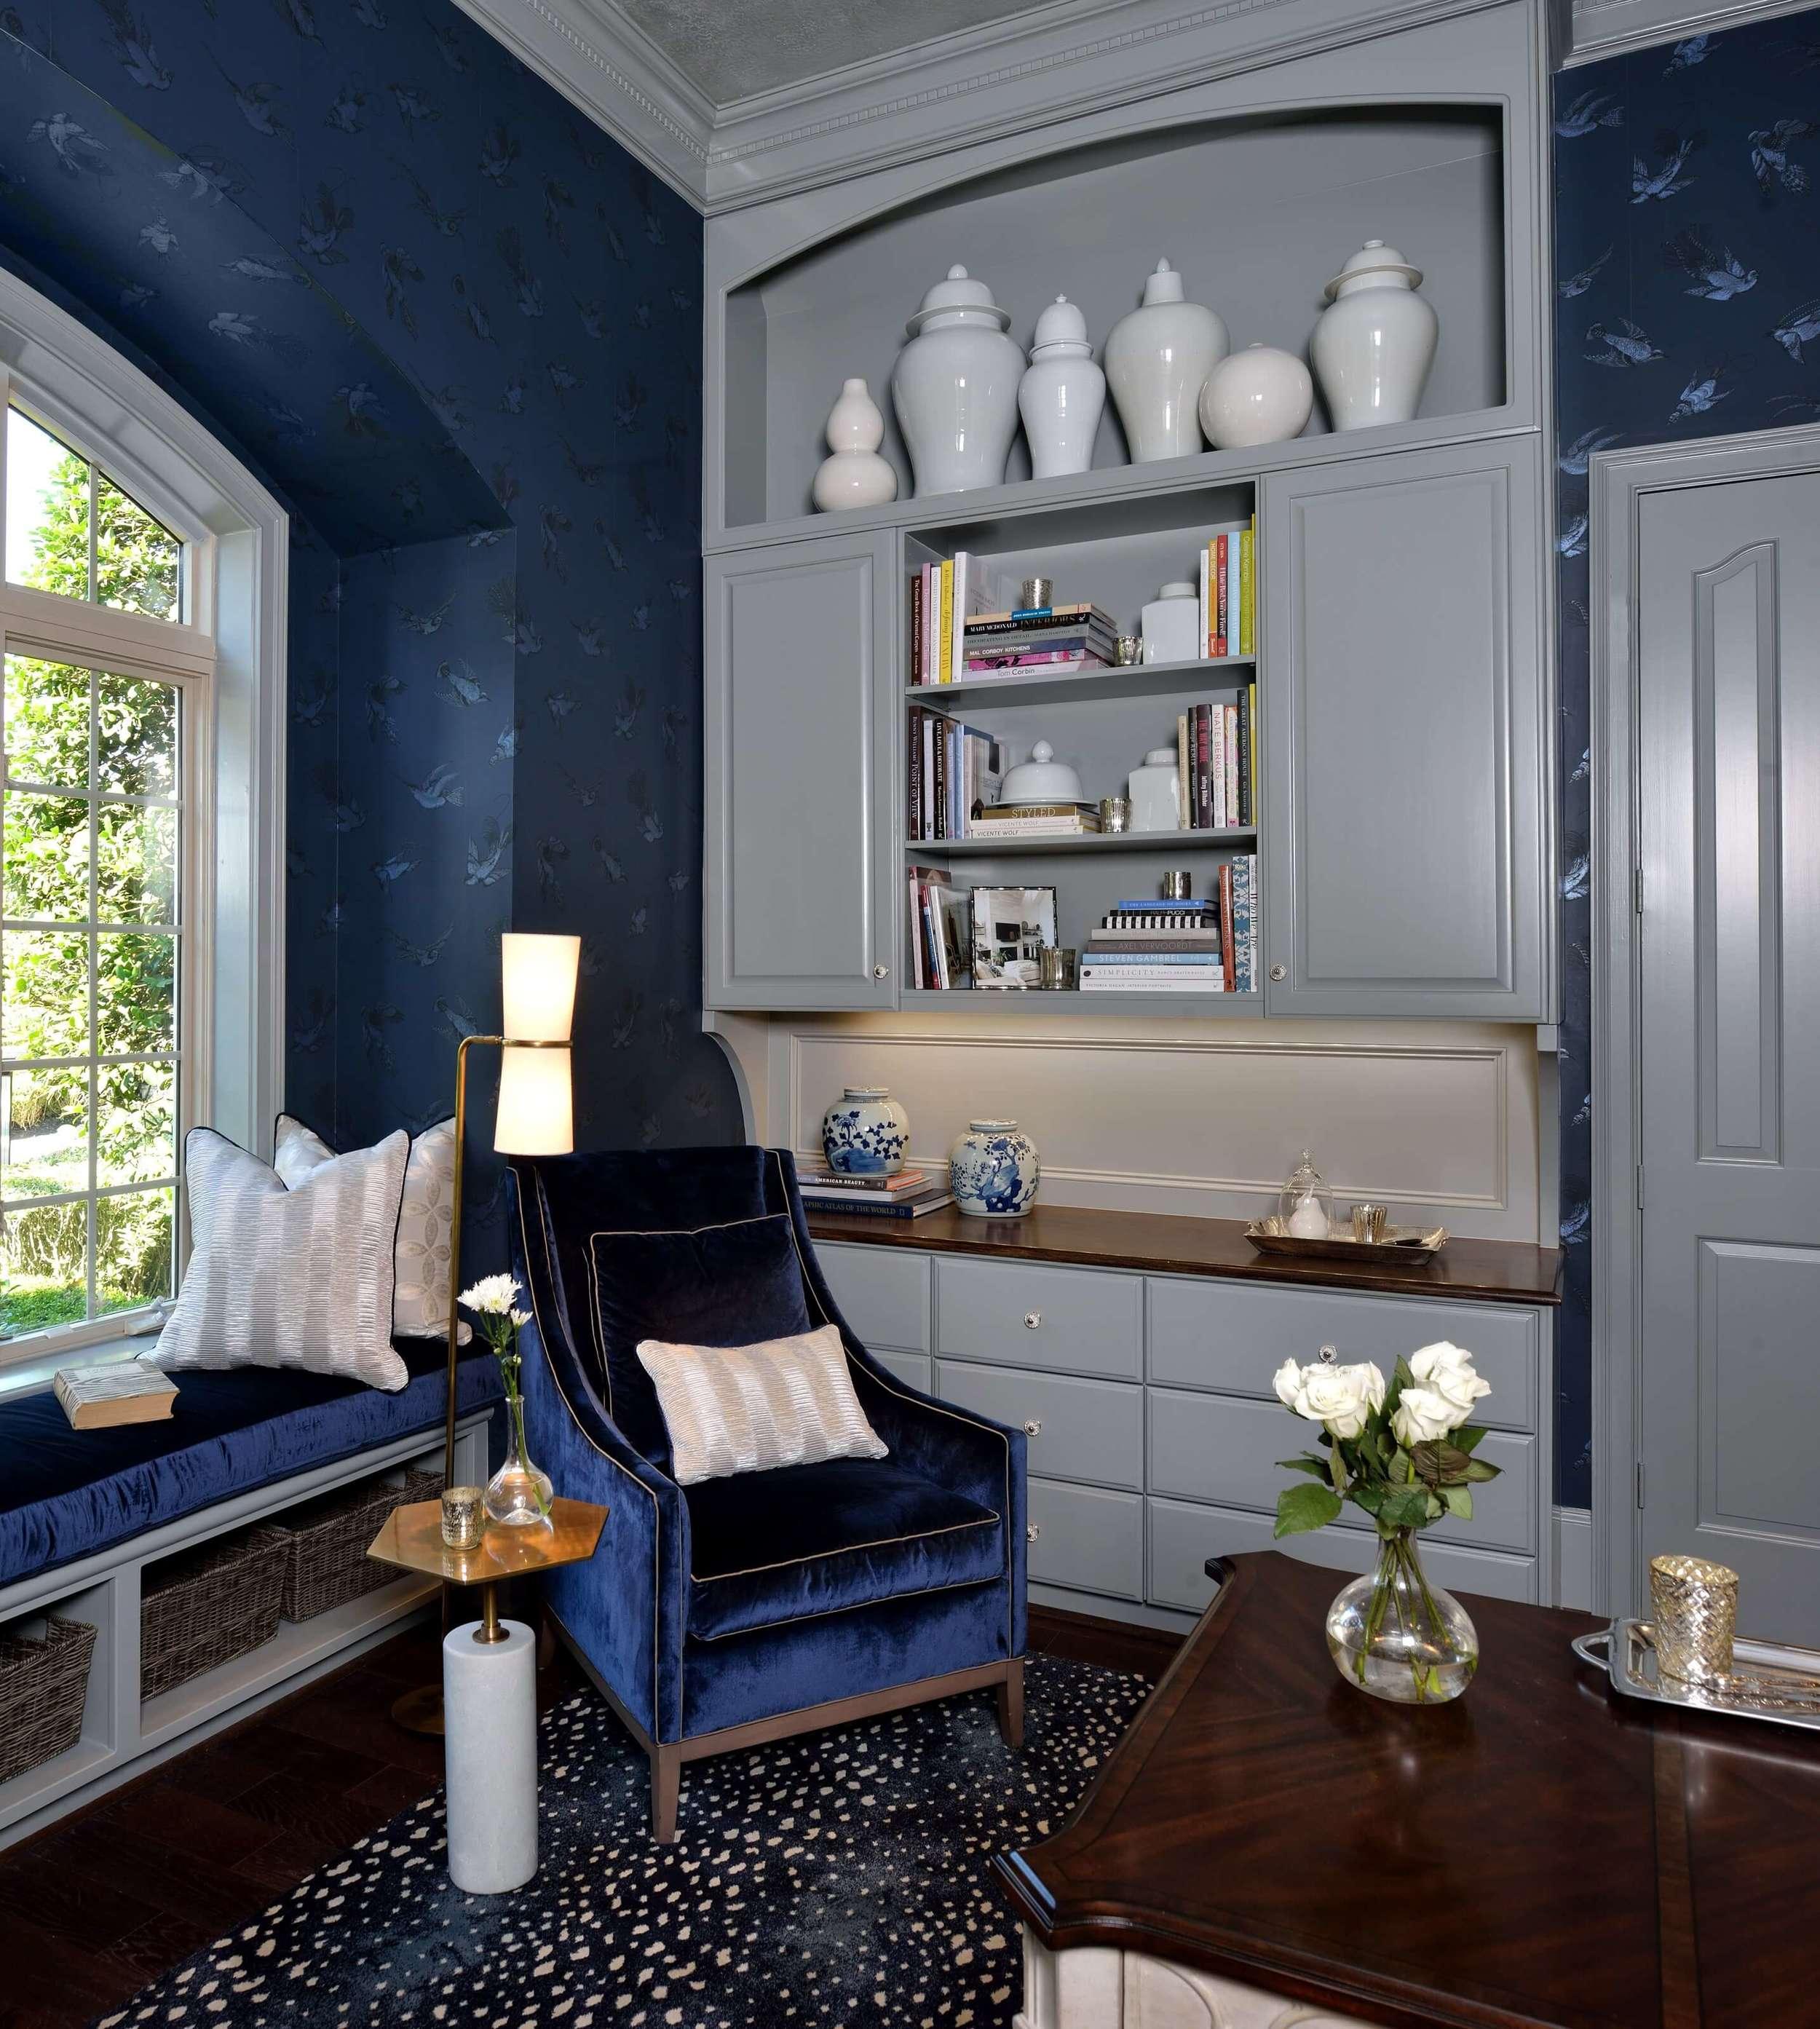 Feminine Home Office - Navy and gray color scheme, Carla Aston, Designer